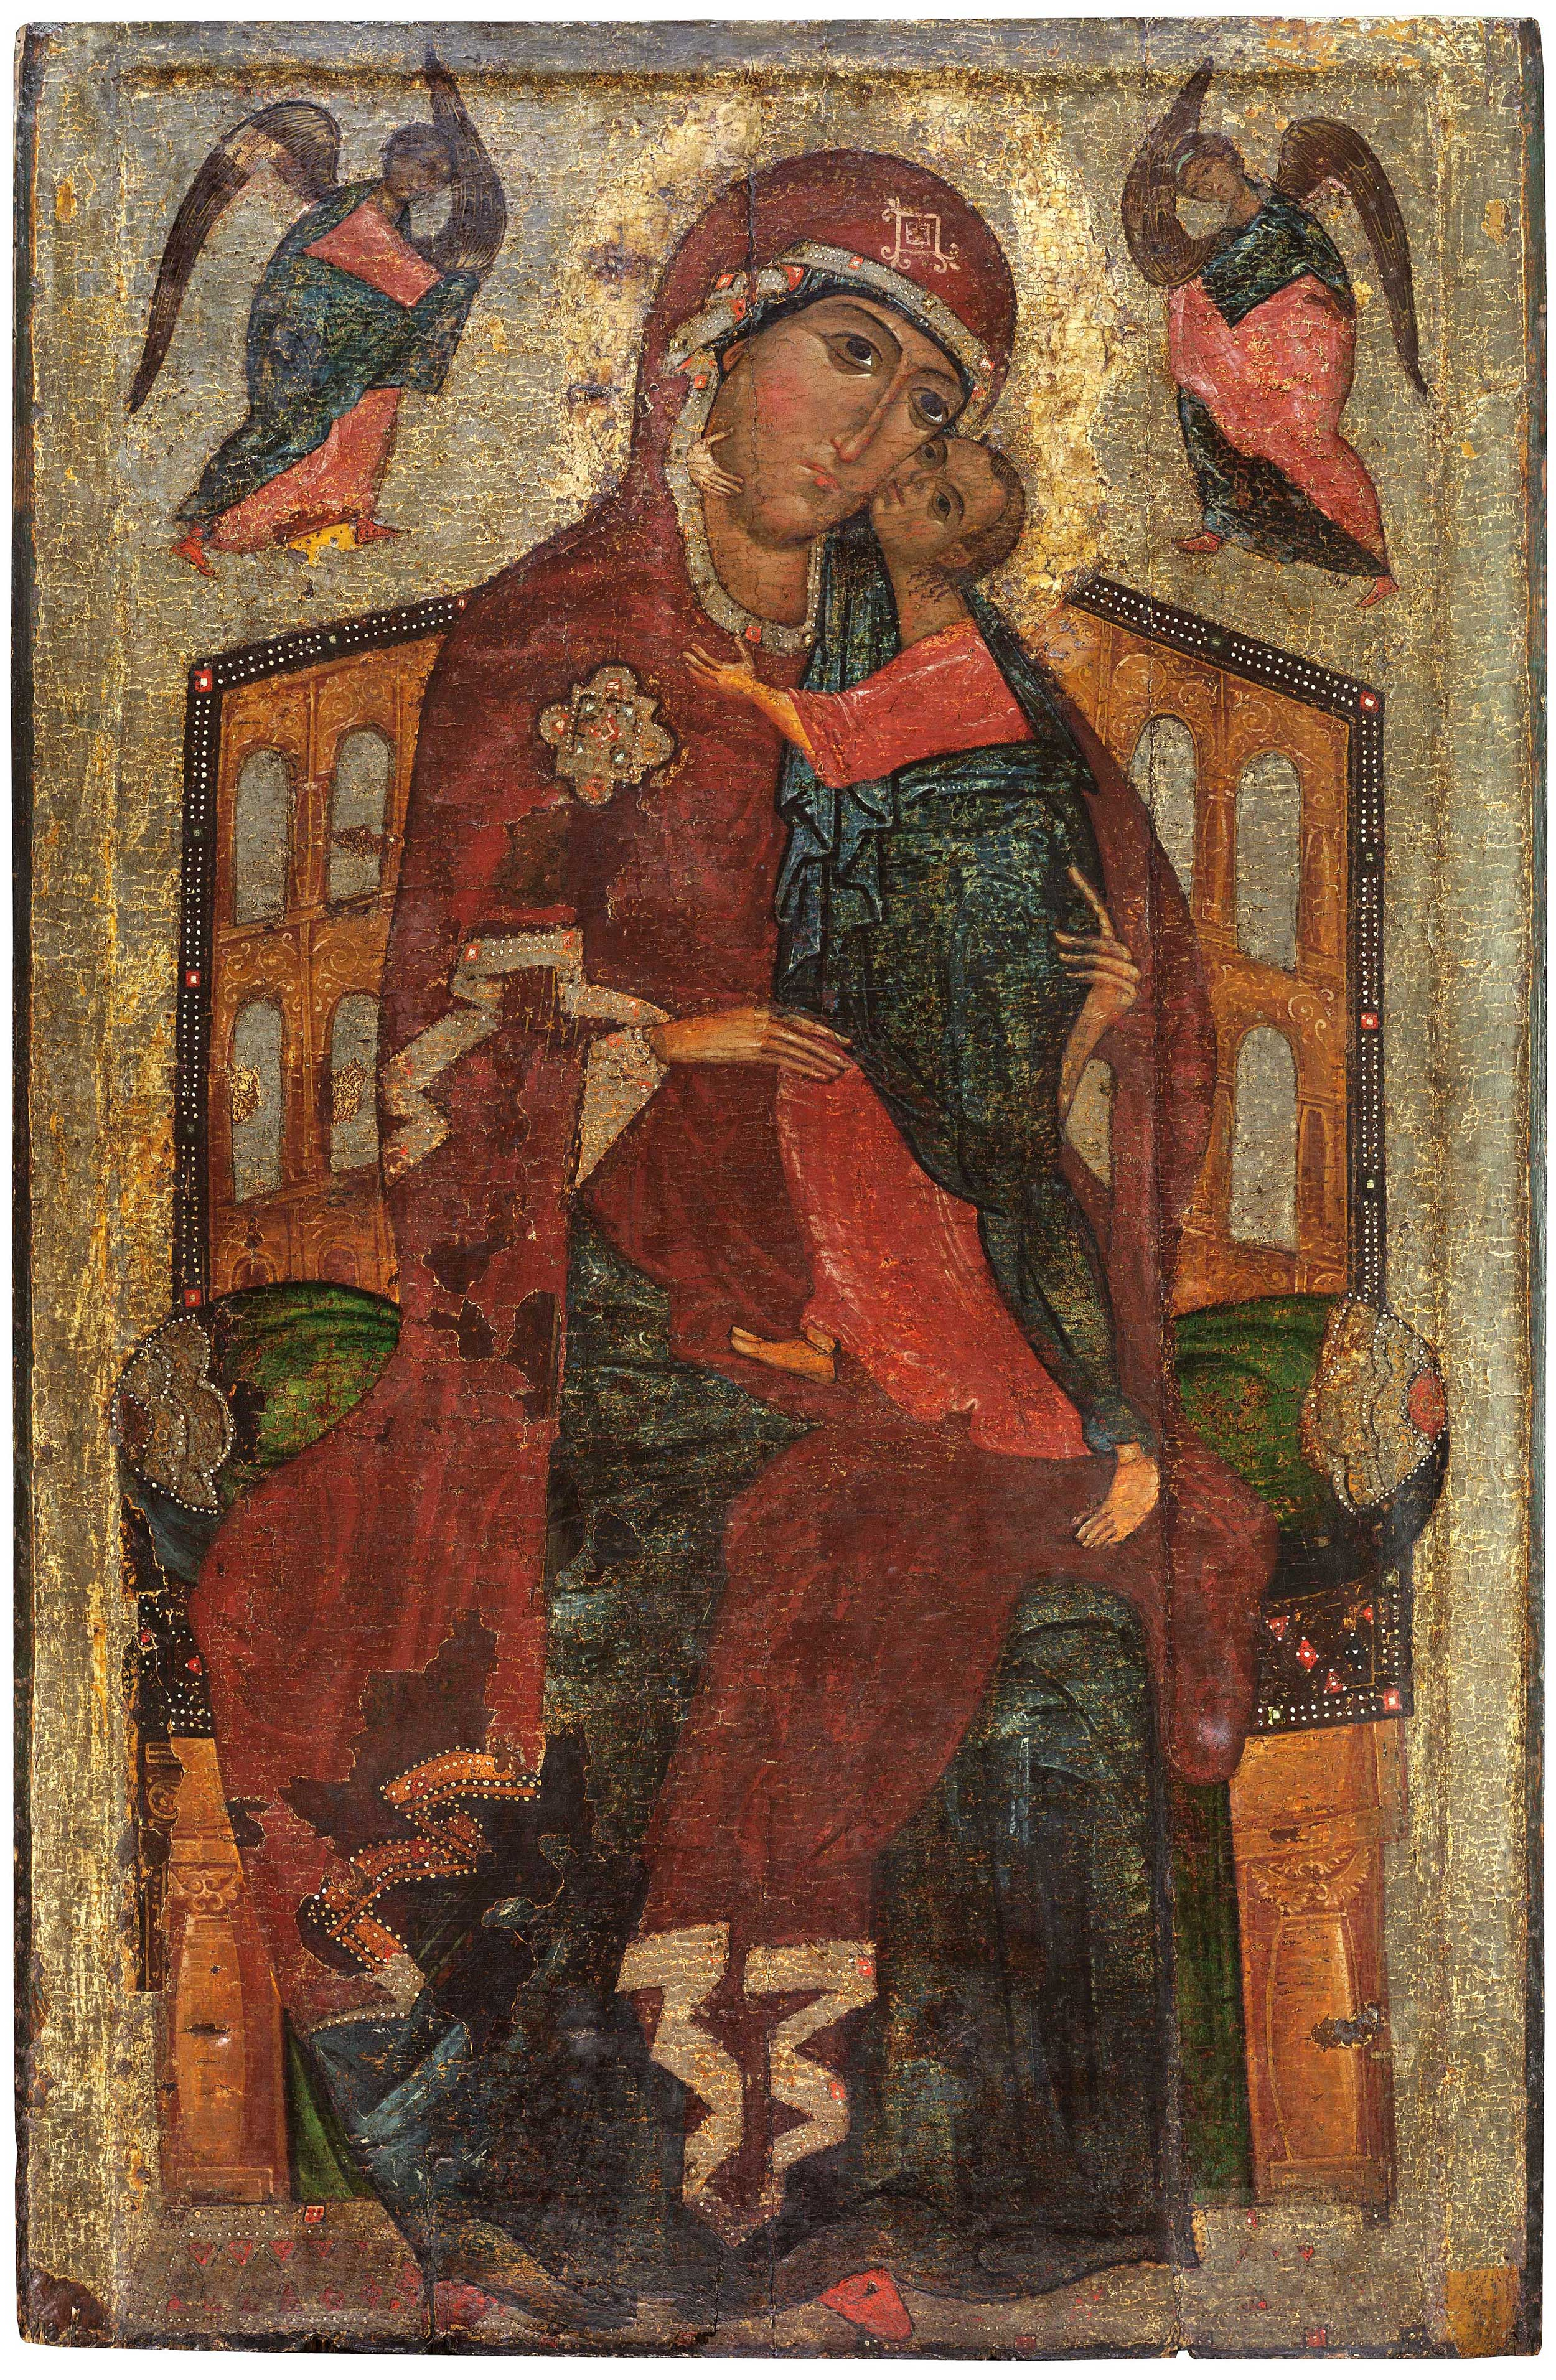 The Virgin of the Tolga